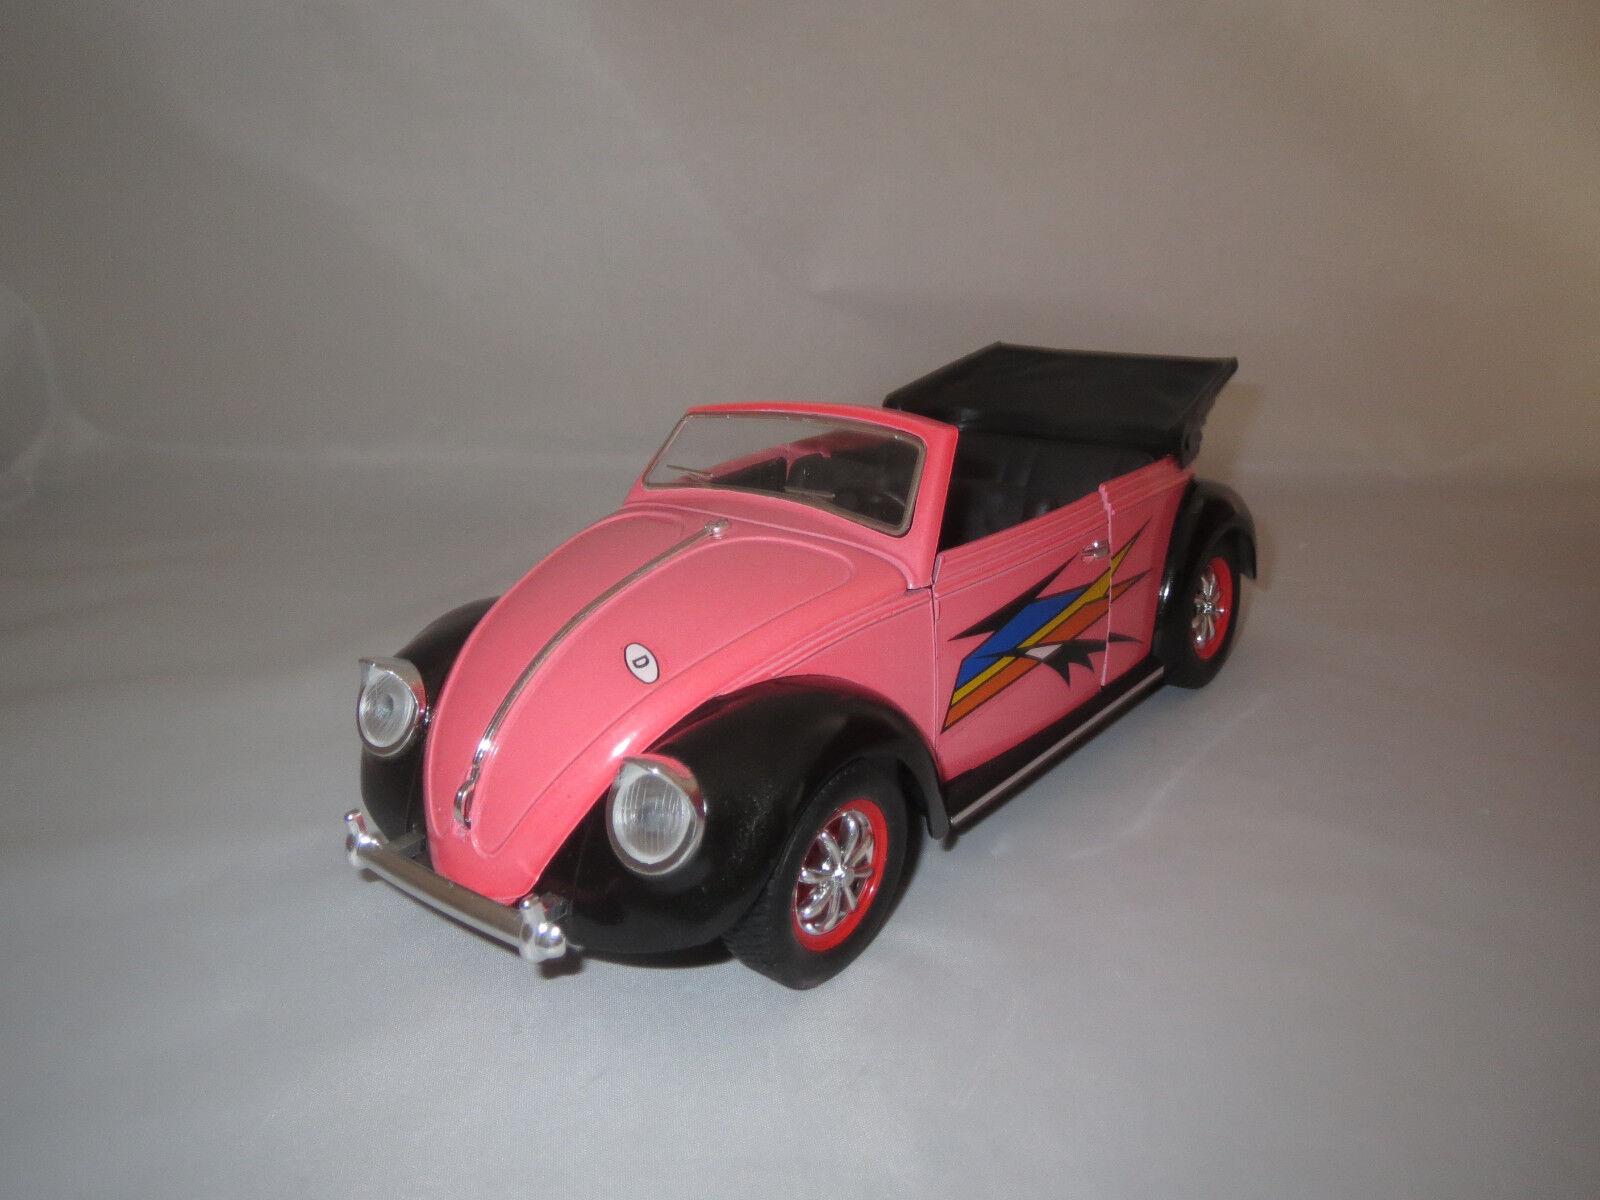 Solido volkswagen coccinelle cabriolet  rose noir  1 17 sans emballage